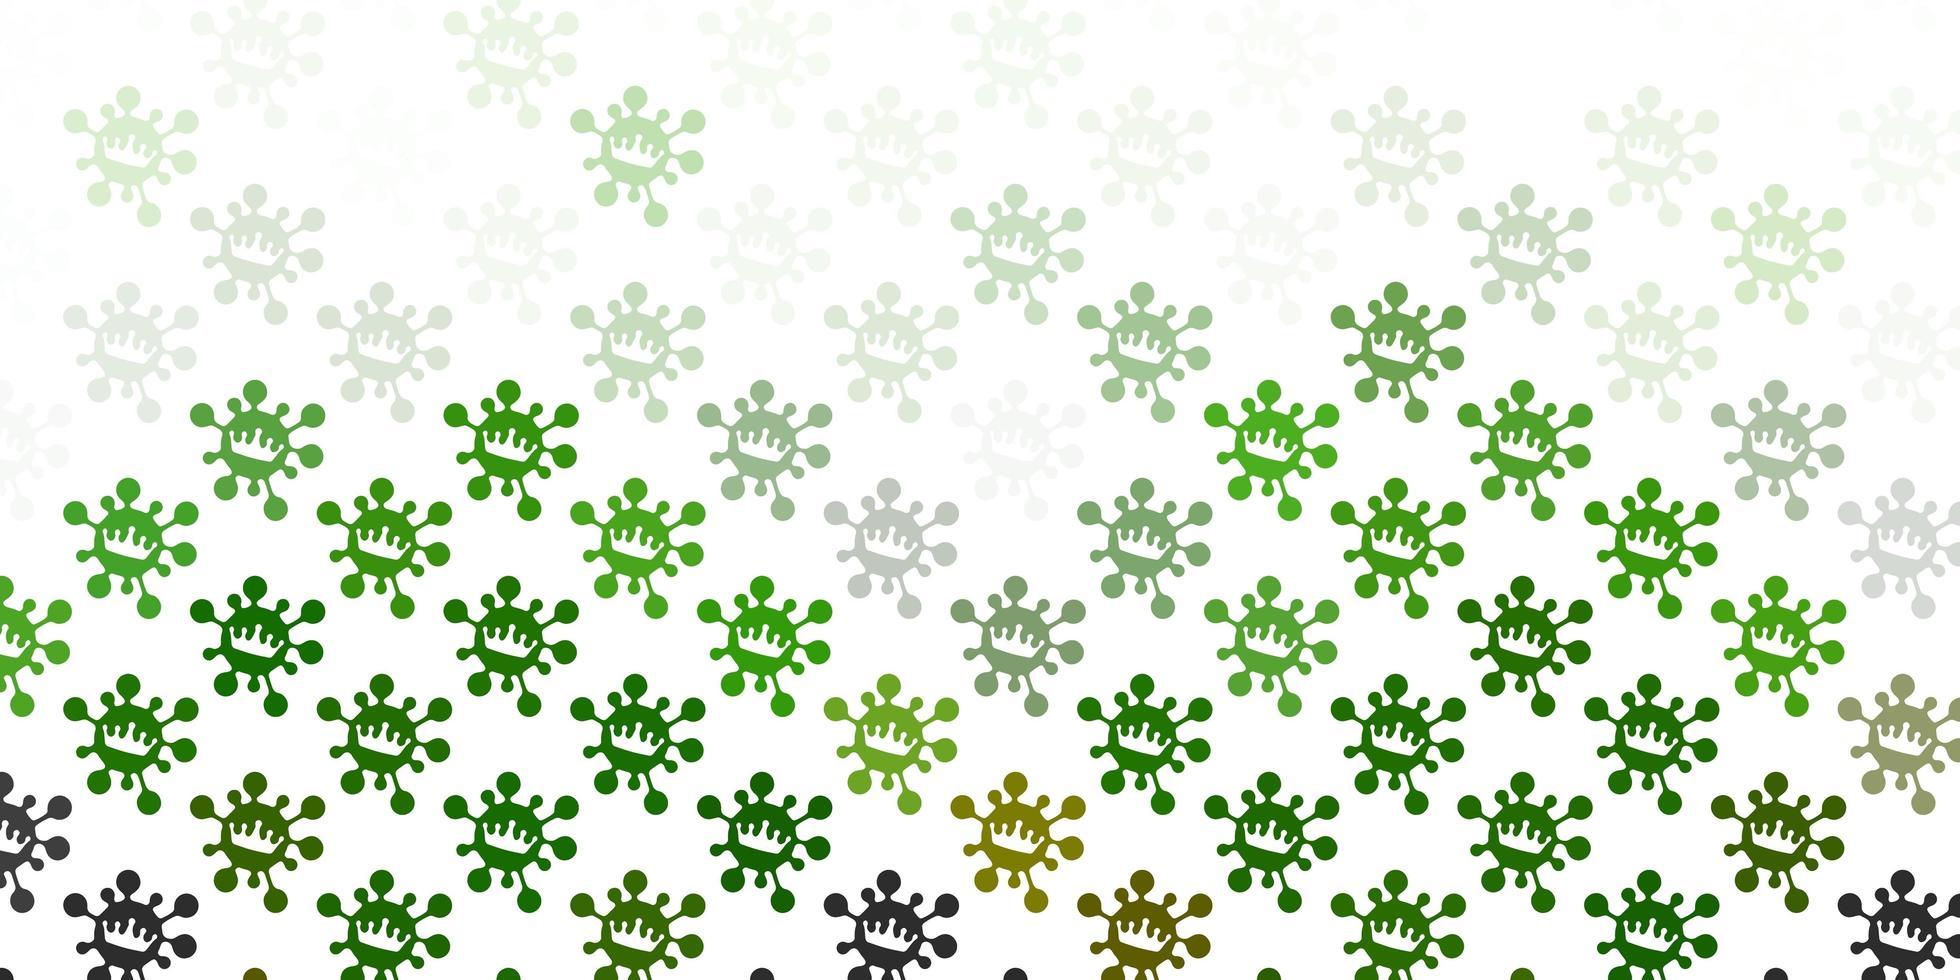 hellgrünes Vektormuster mit Coronavirus-Elementen. vektor